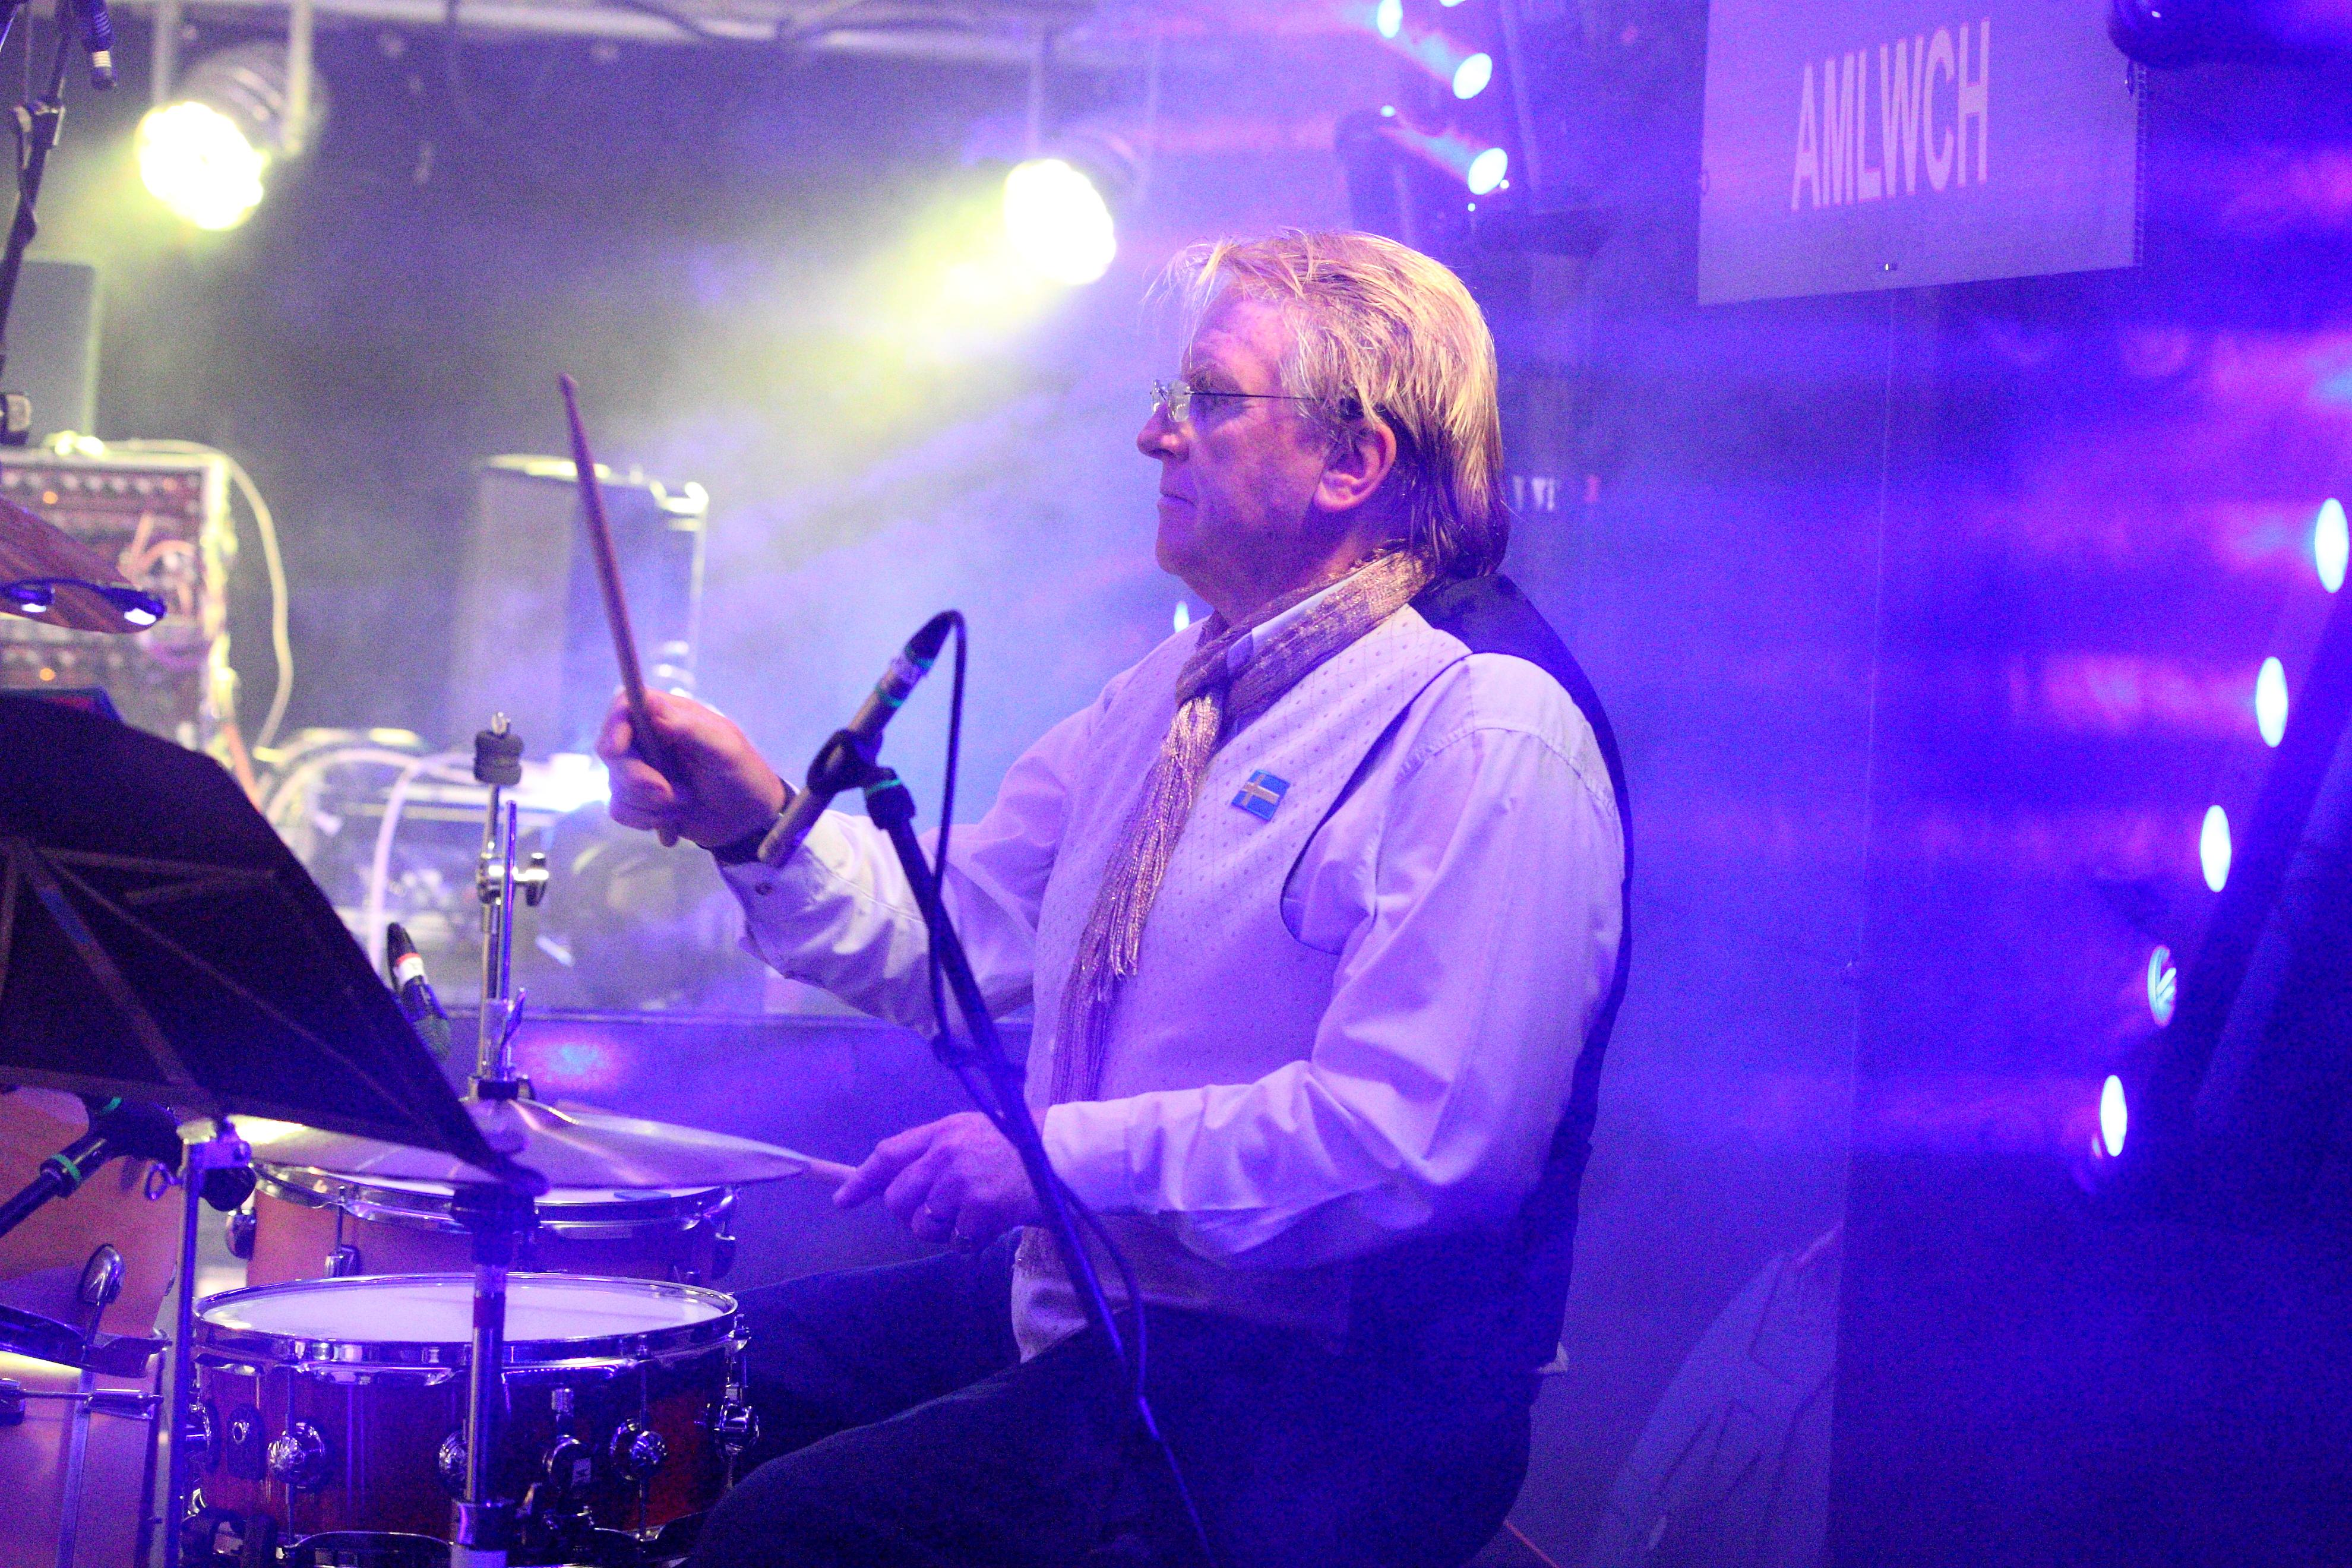 ABBA Chique drummer